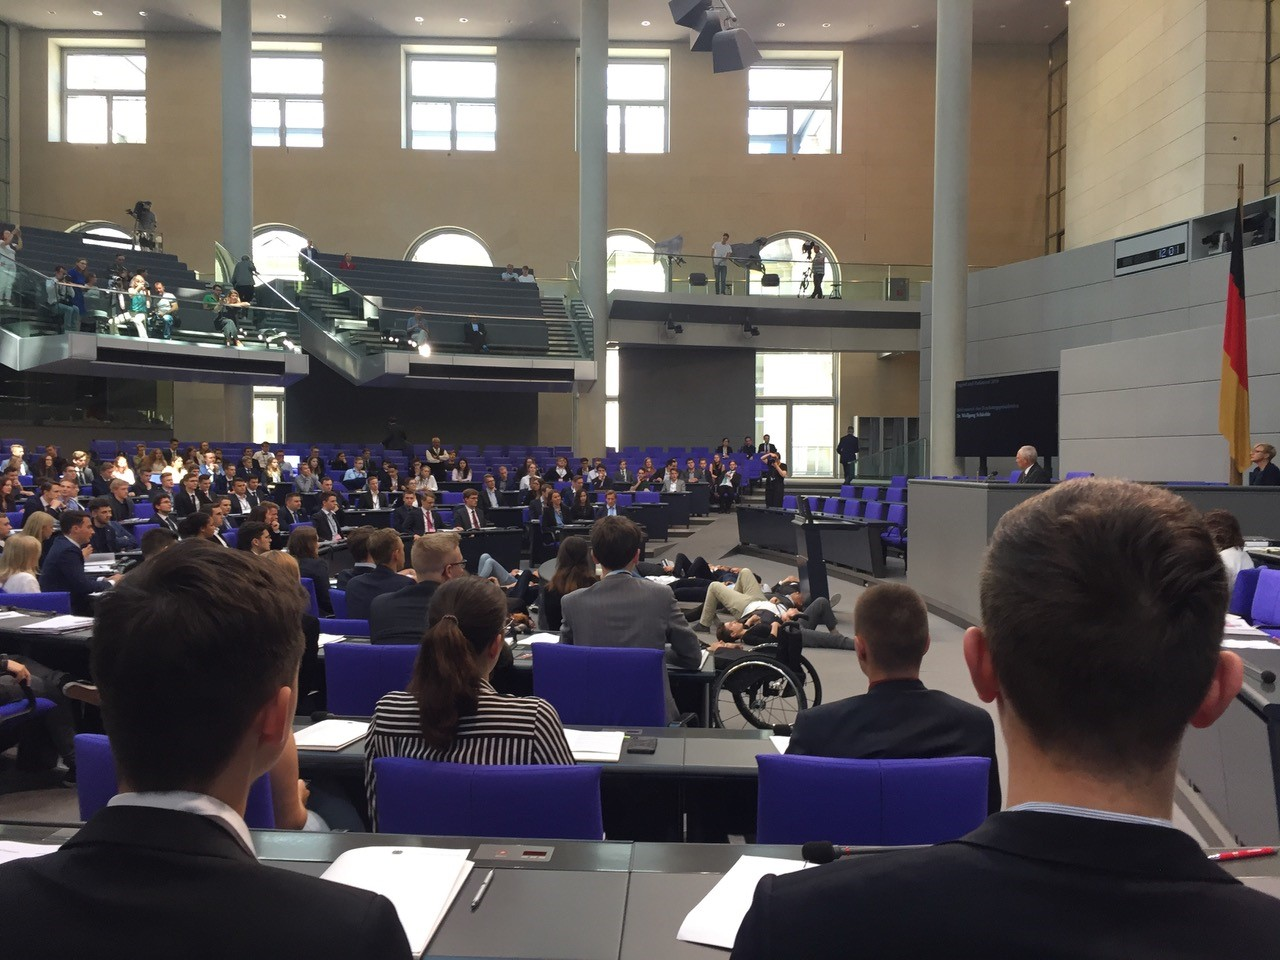 Jugend und Parlament 2019